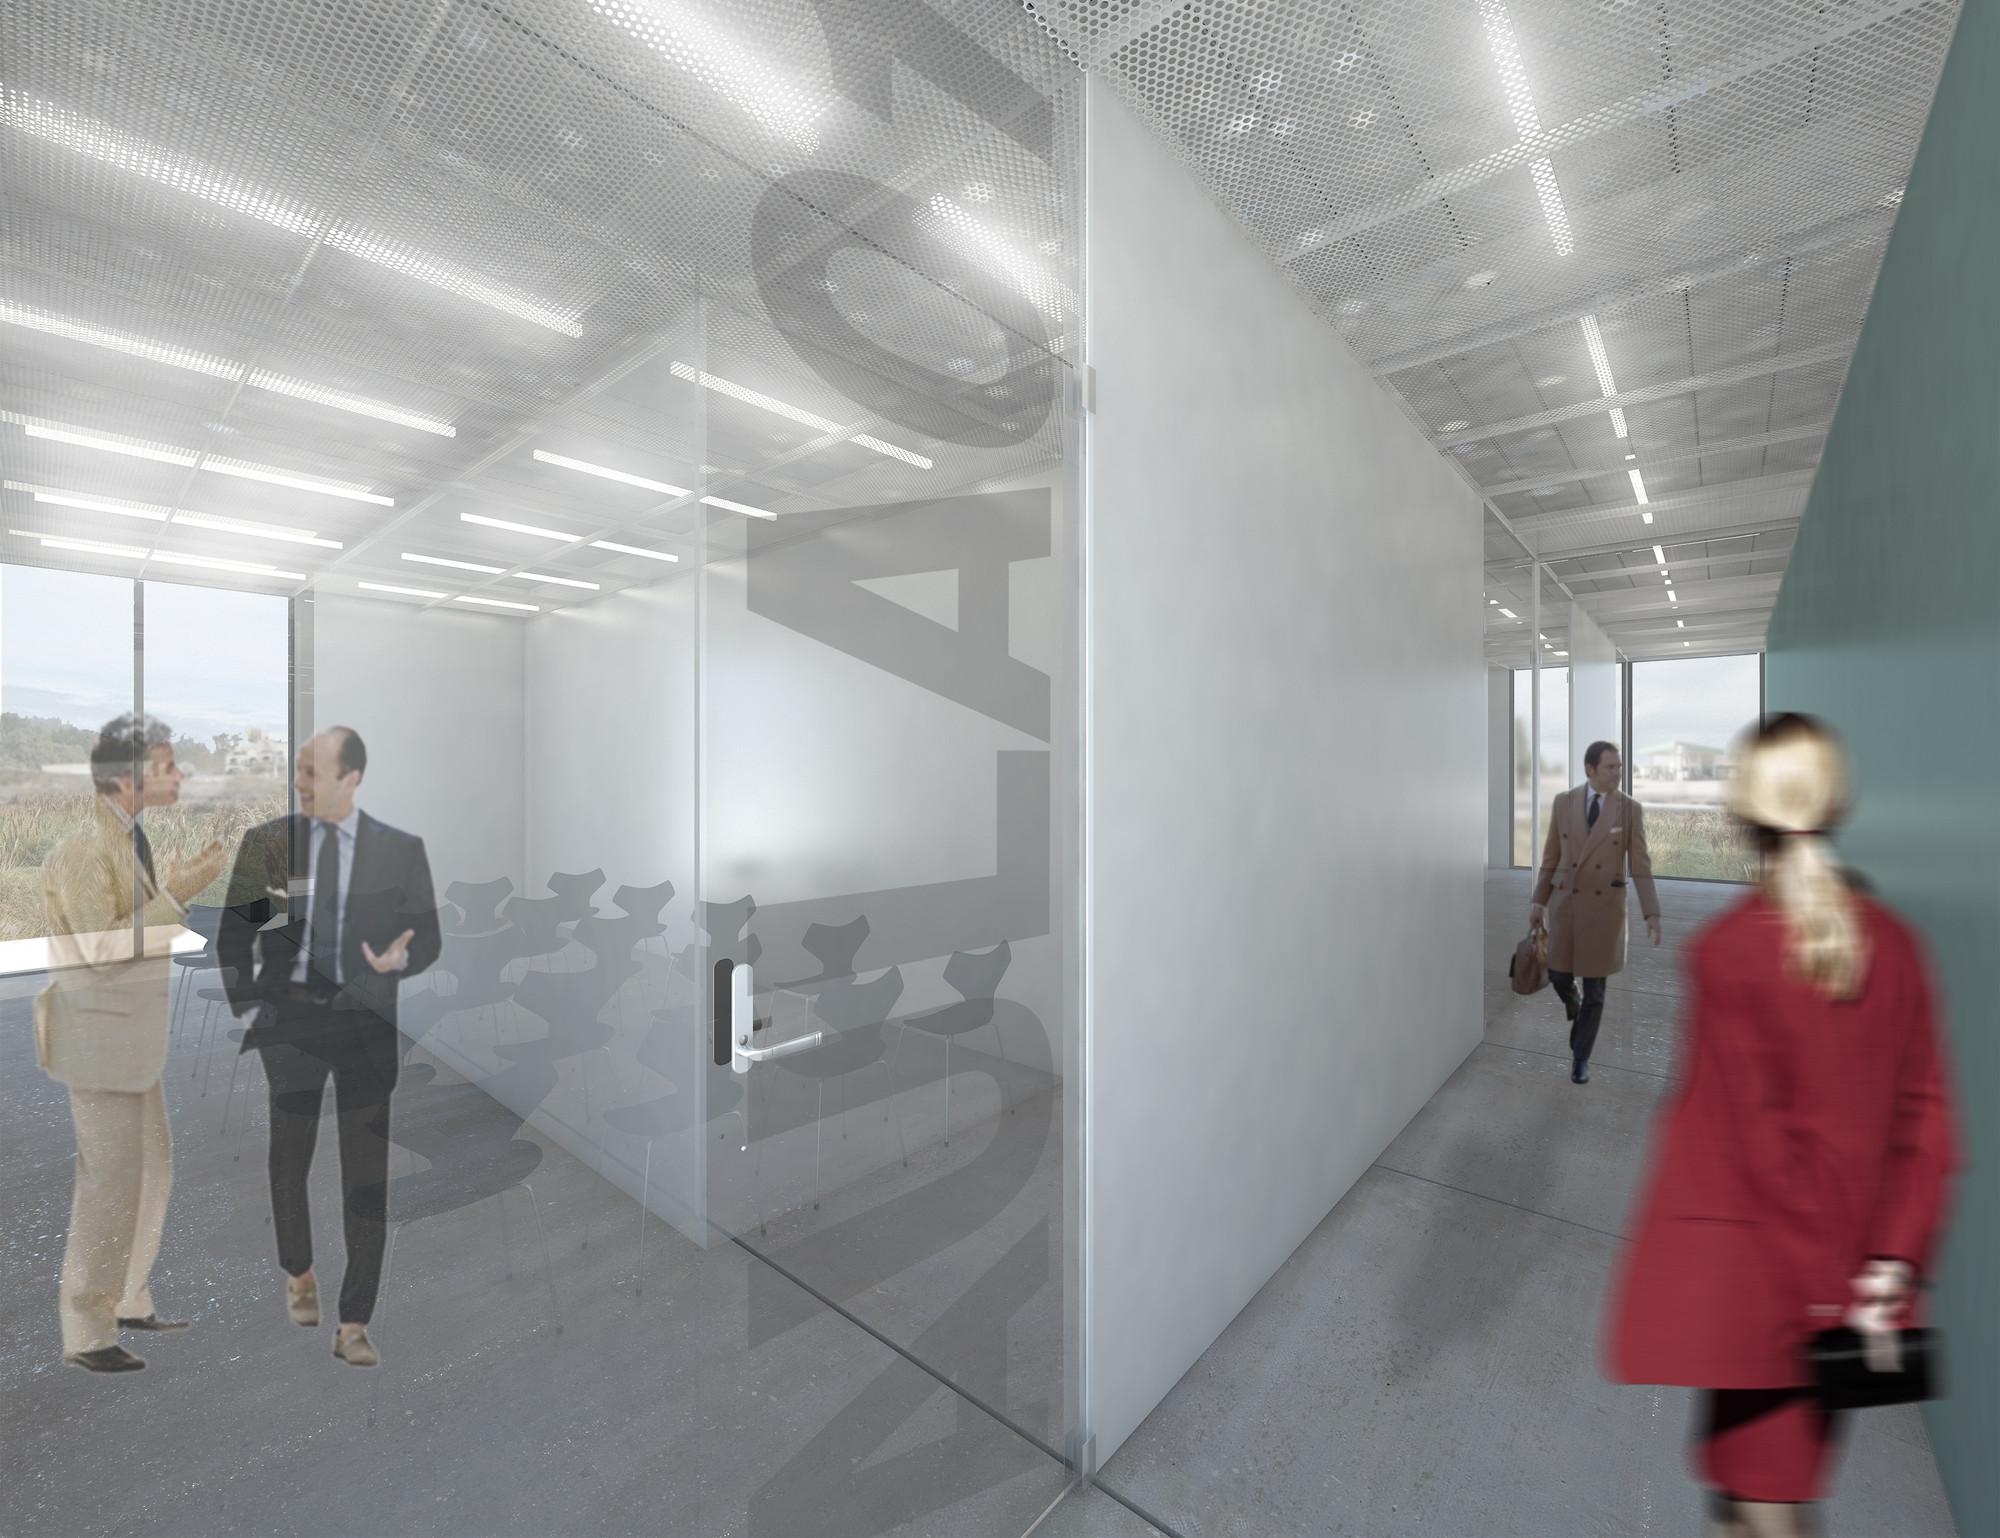 Cortesia de Agencia de Arquitectura